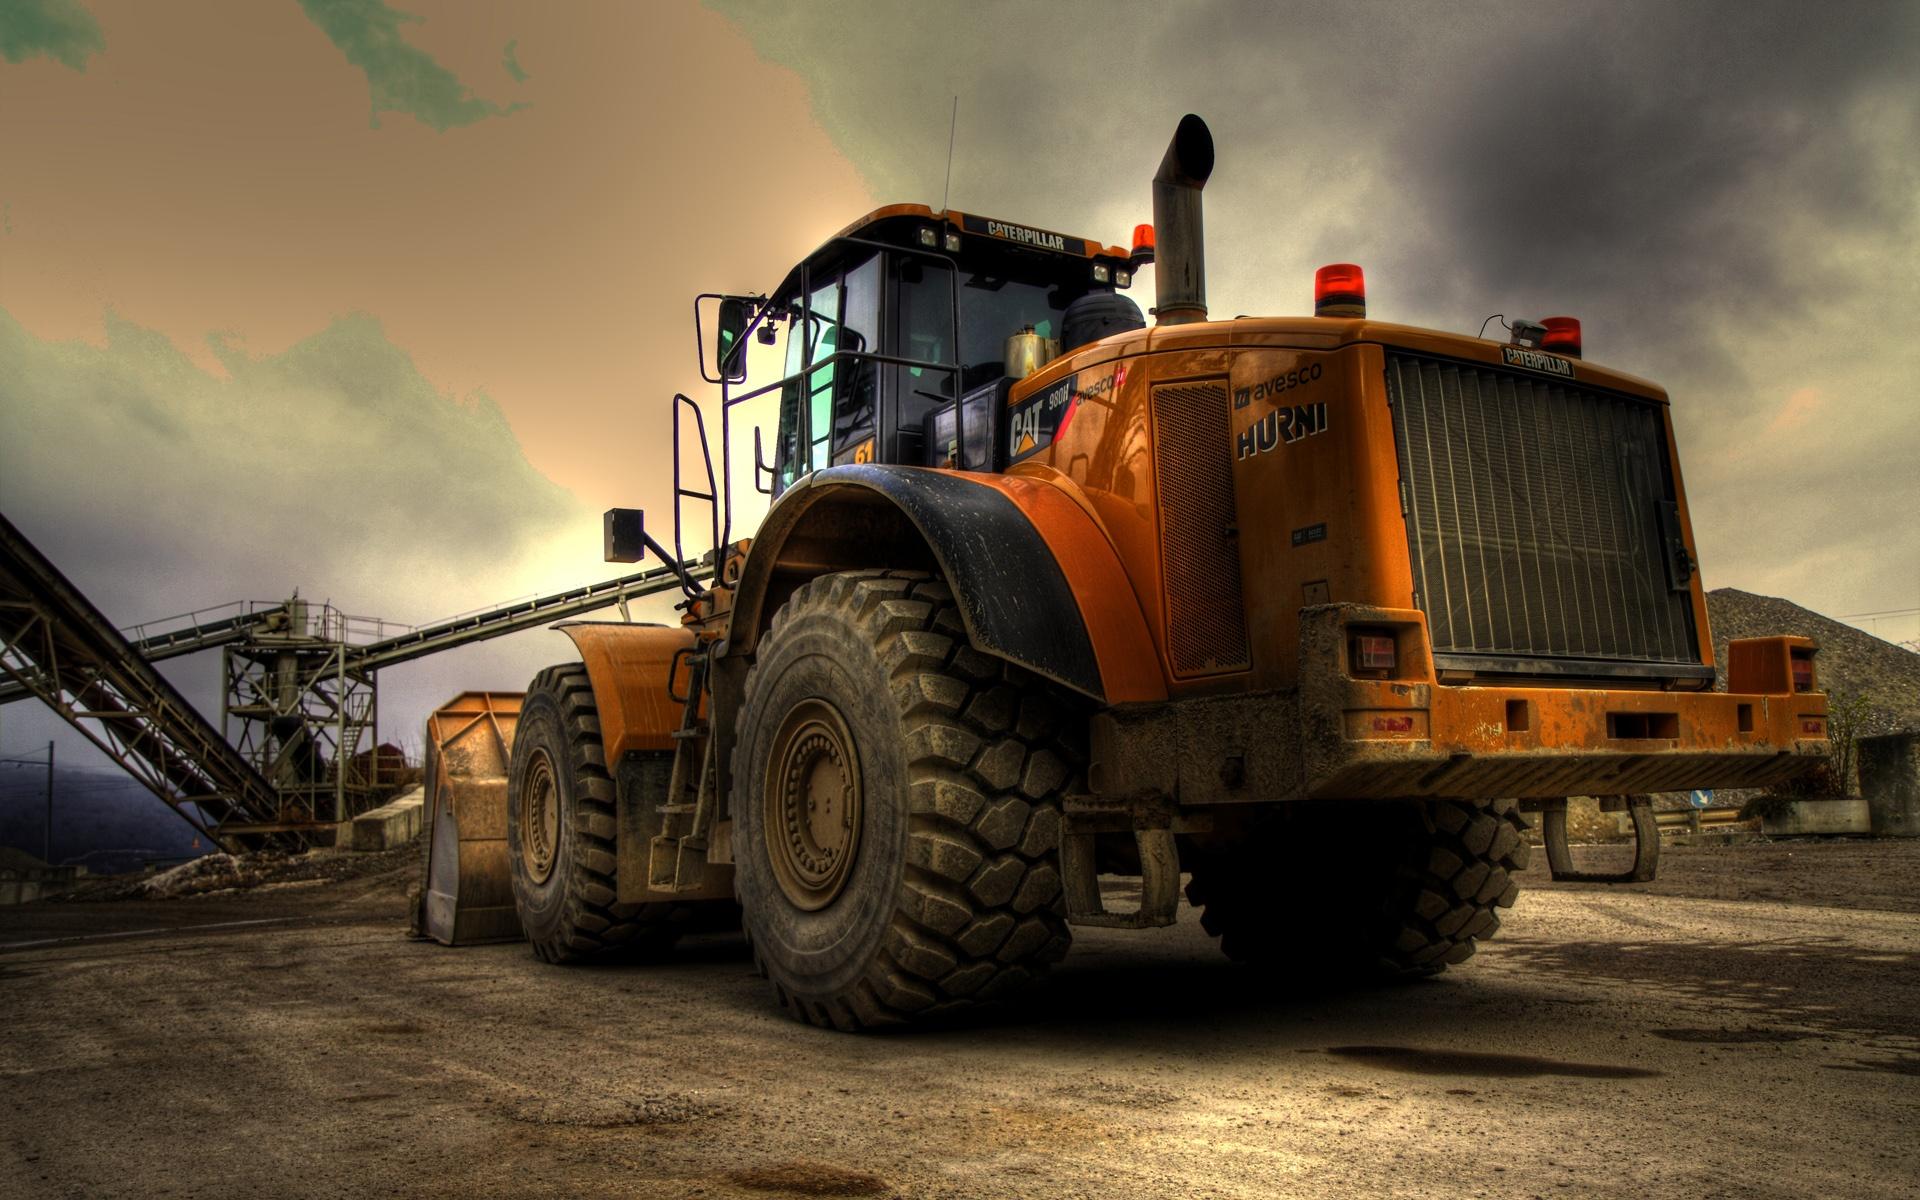 Caterpillar Bulldozer bulldozer car caterpillar gray road truck 1920x1200